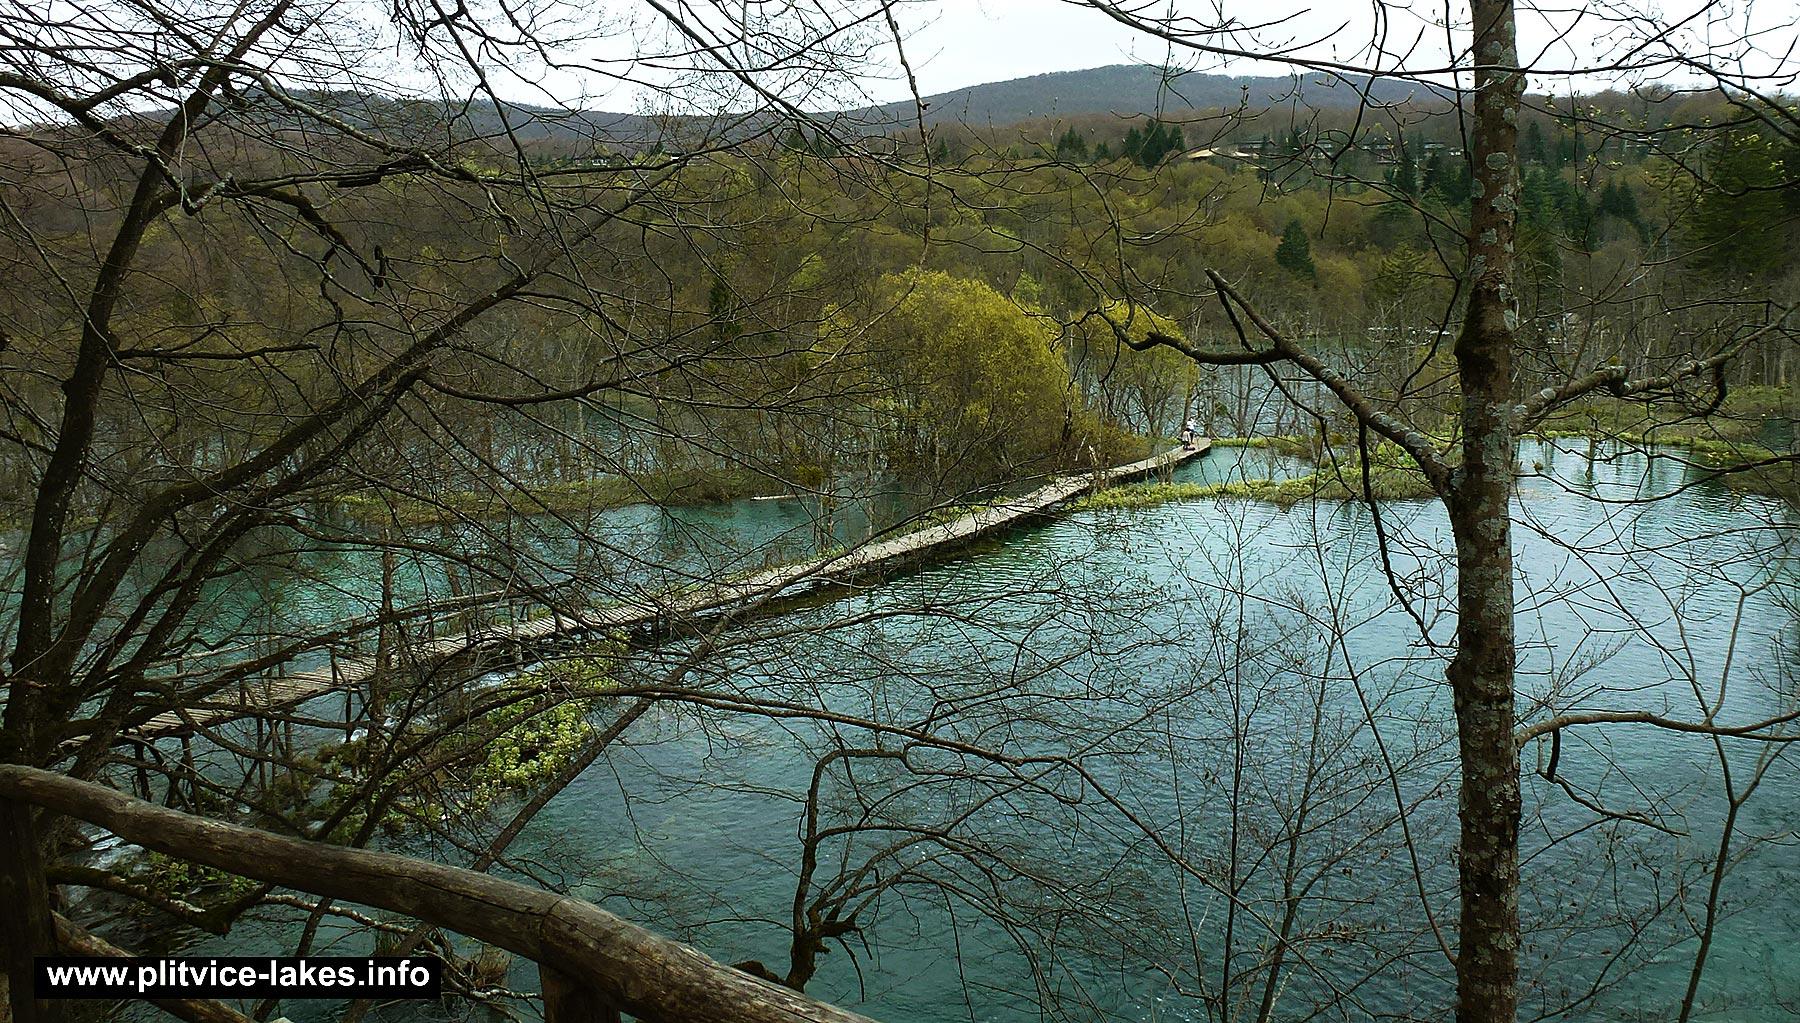 Small Burgeti Lakes (Ponds) @ Plitvicka Jezera